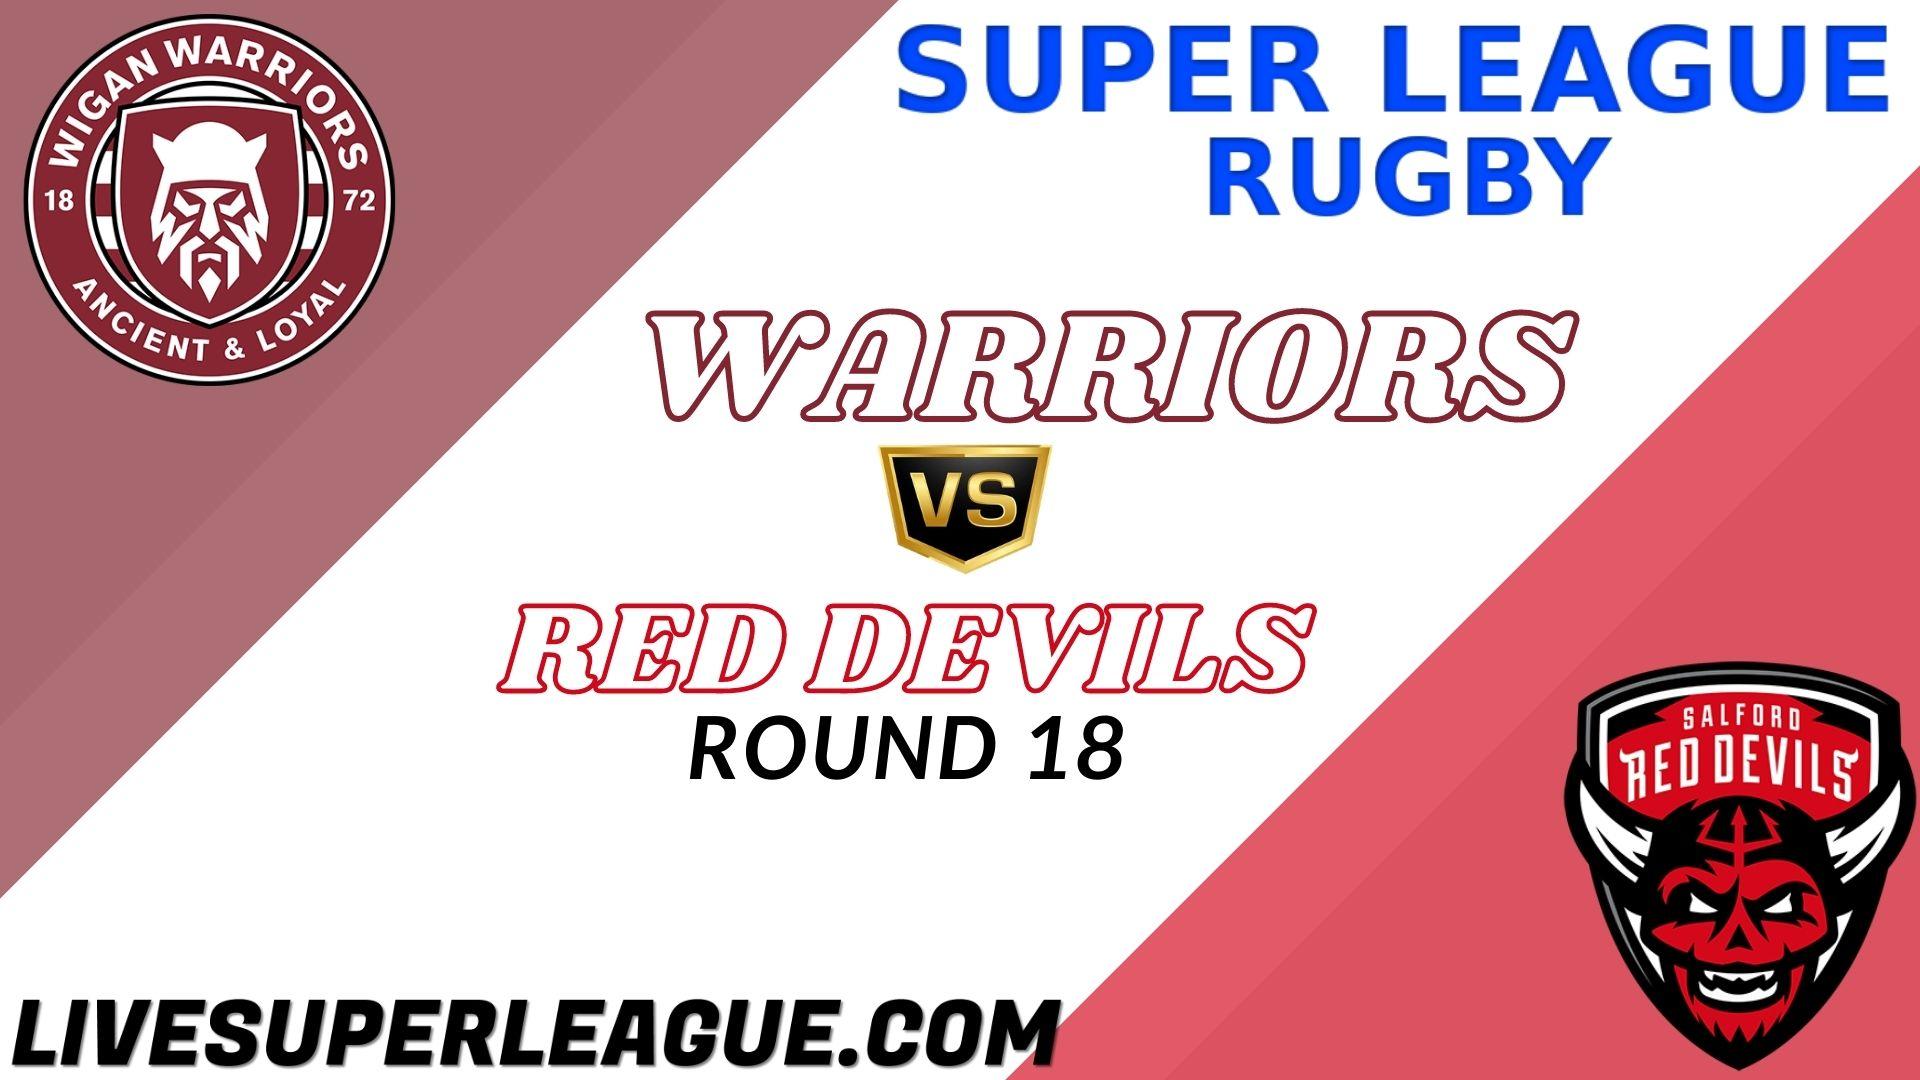 Warriors Vs Red Devils RD 18 Live Stream 2021 | Full Match Replay